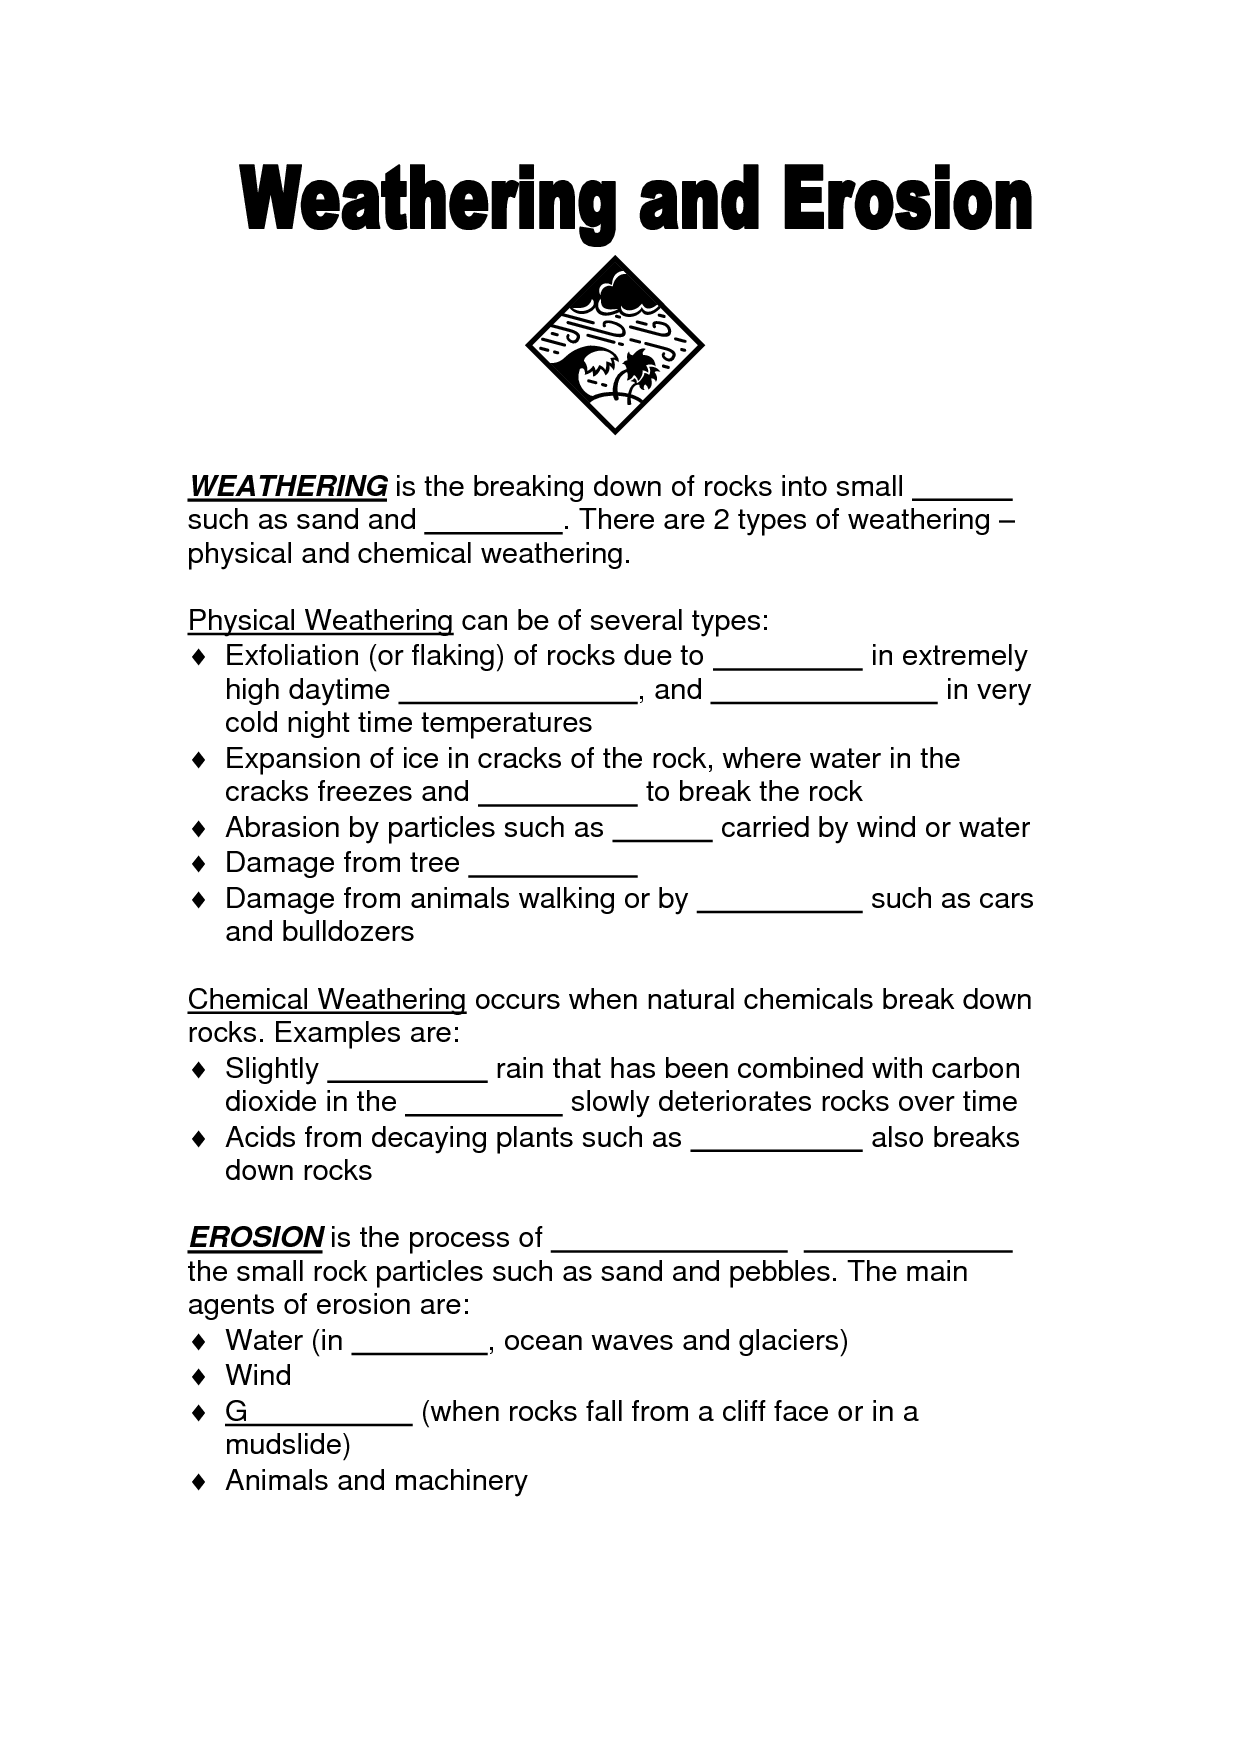 Soil Erosion Diagram Weathering And Erosion 4th Grade Worksheets